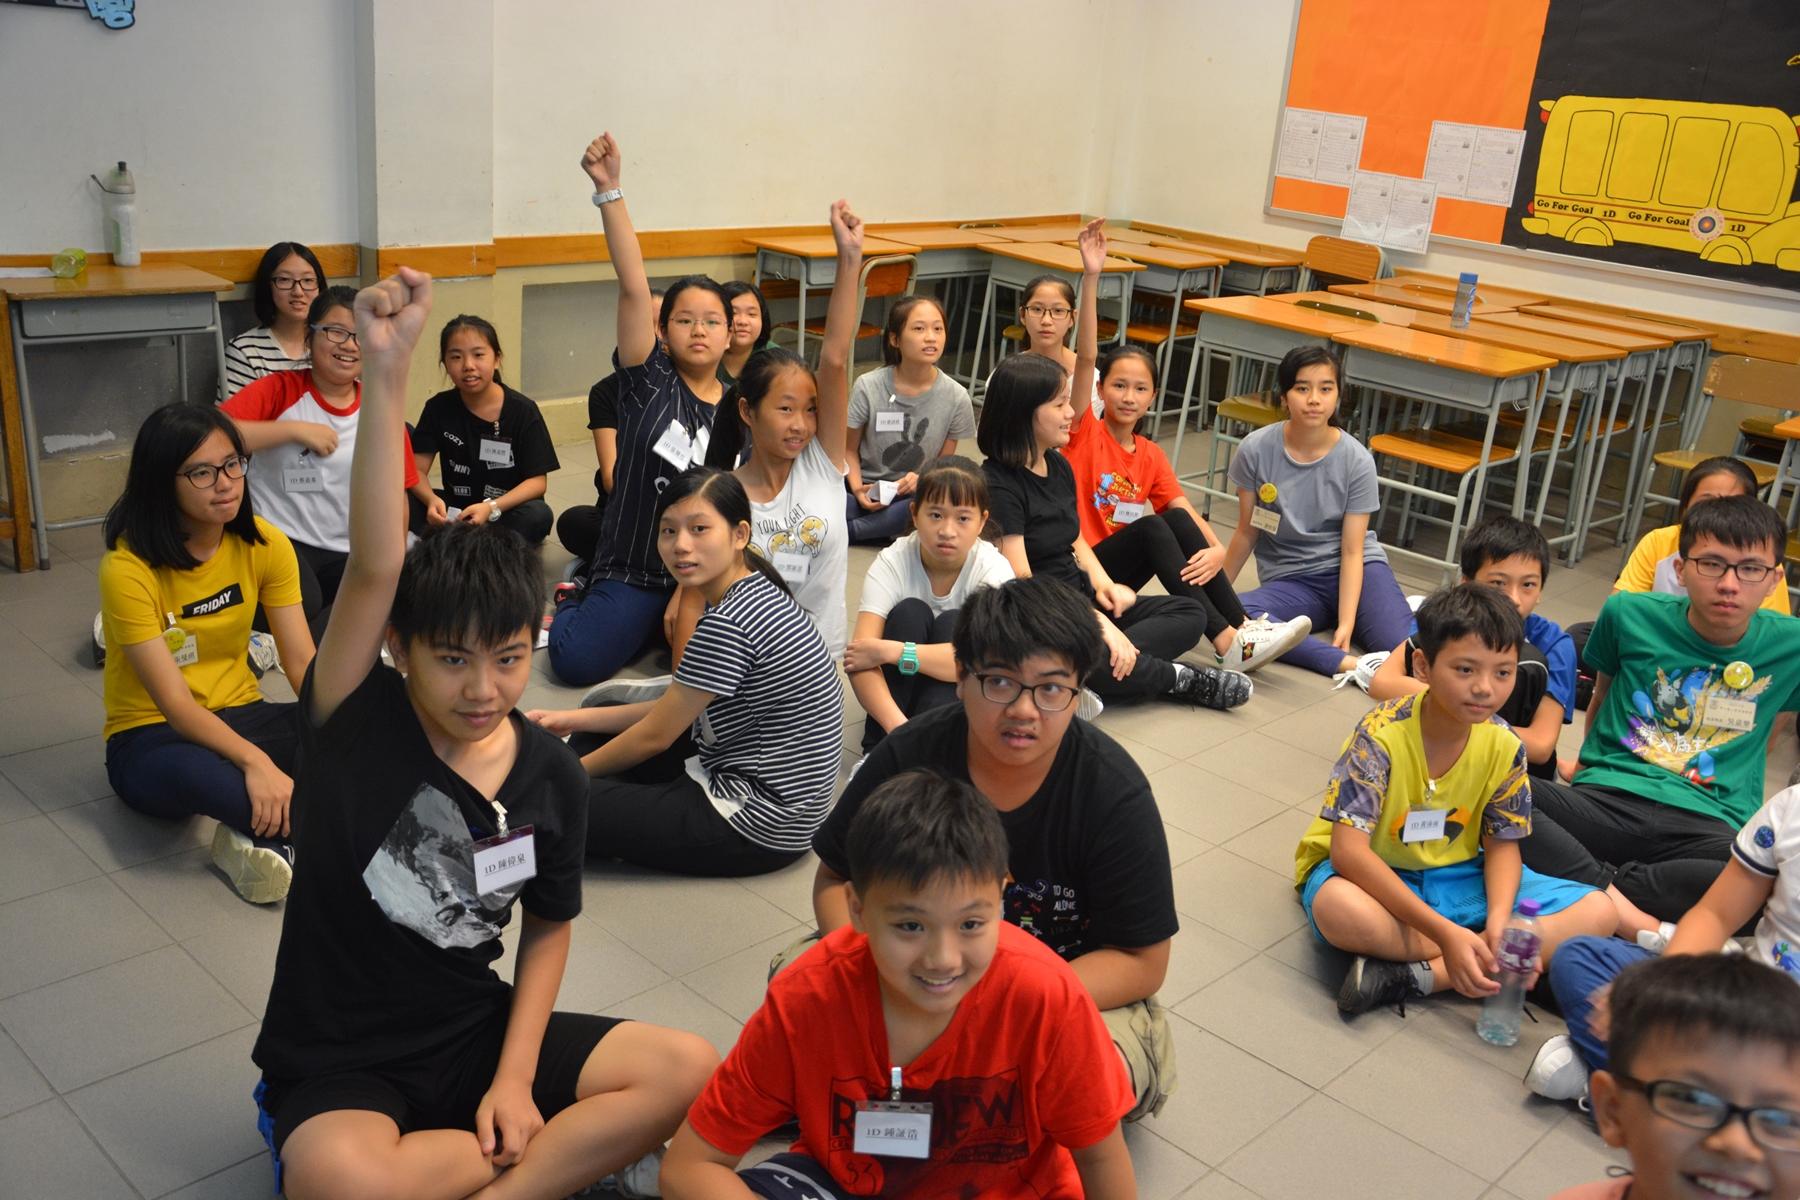 http://www.npc.edu.hk/sites/default/files/1d_wen_gu_zhi_xin_20170816_02.jpg